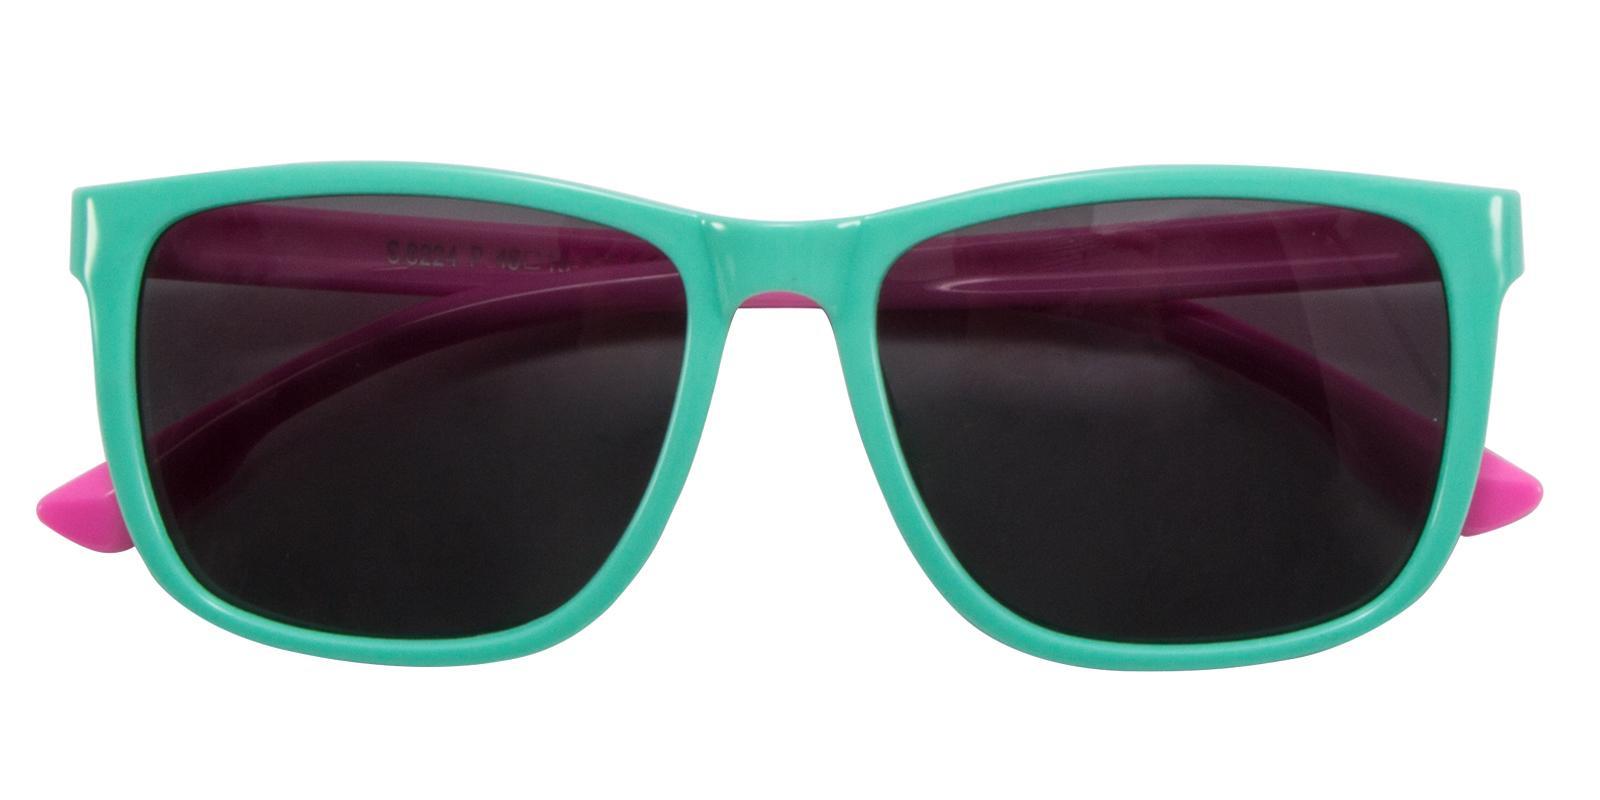 Hyacin Green TR Sunglasses , UniversalBridgeFit Frames from ABBE Glasses